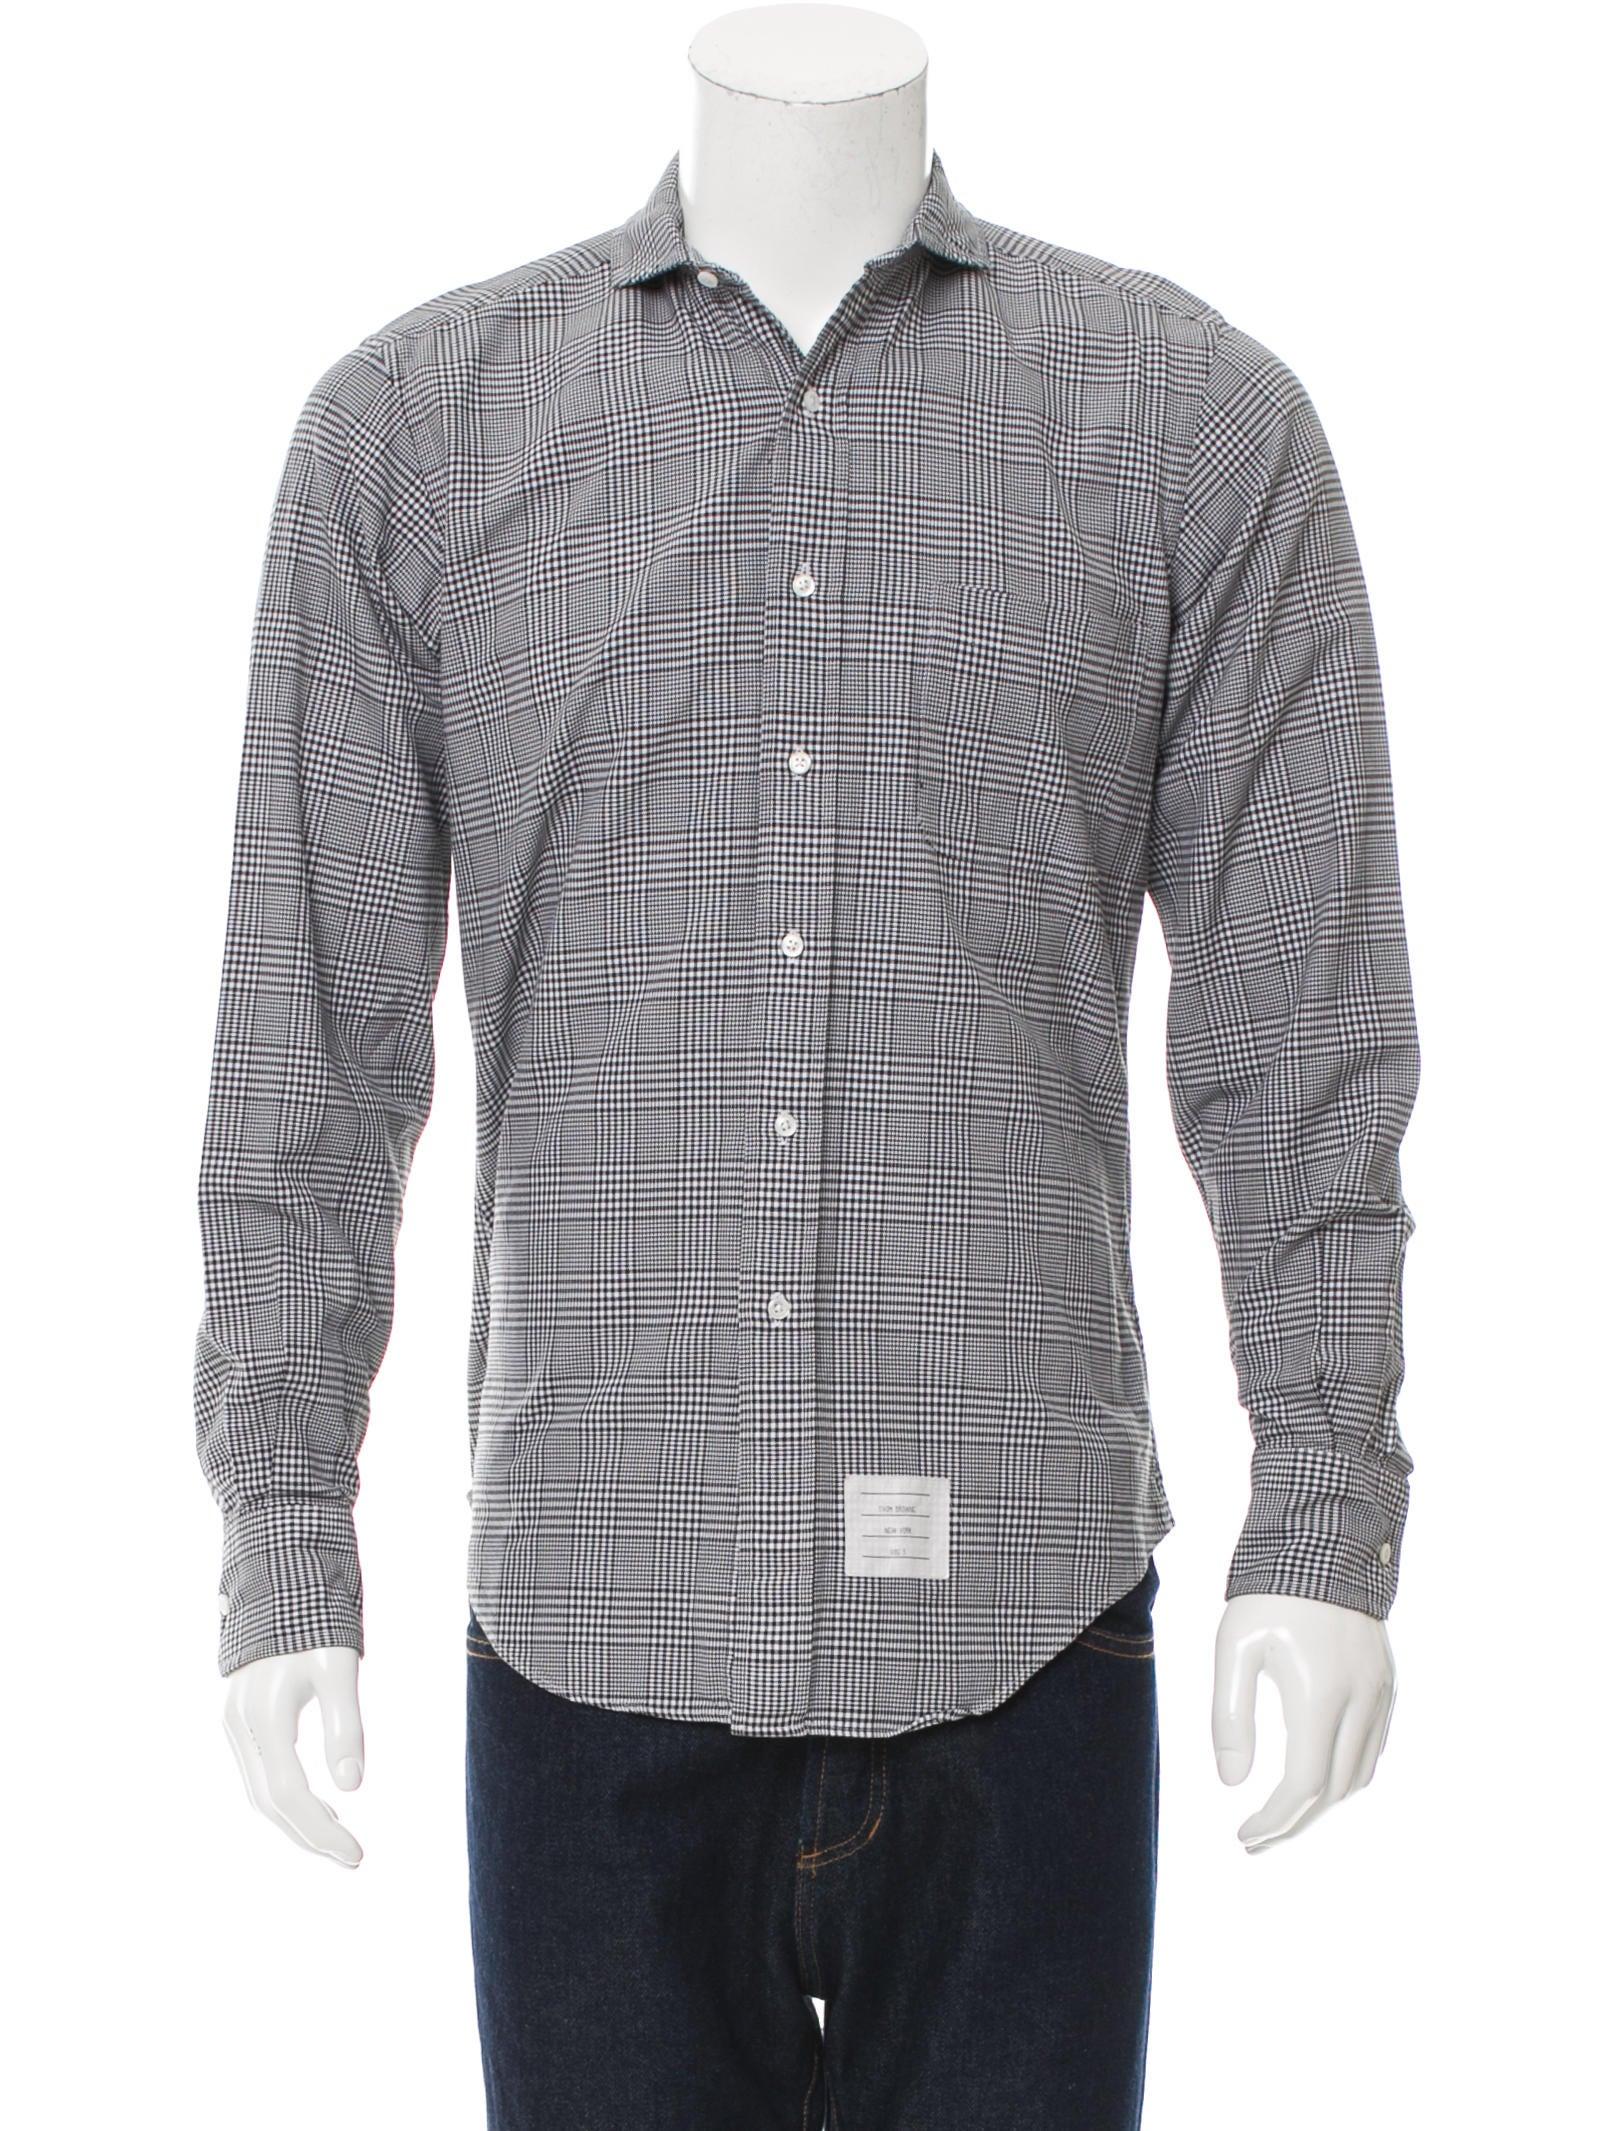 Thom browne plaid button up shirt clothing tho21790 for Thom browne shirt sale